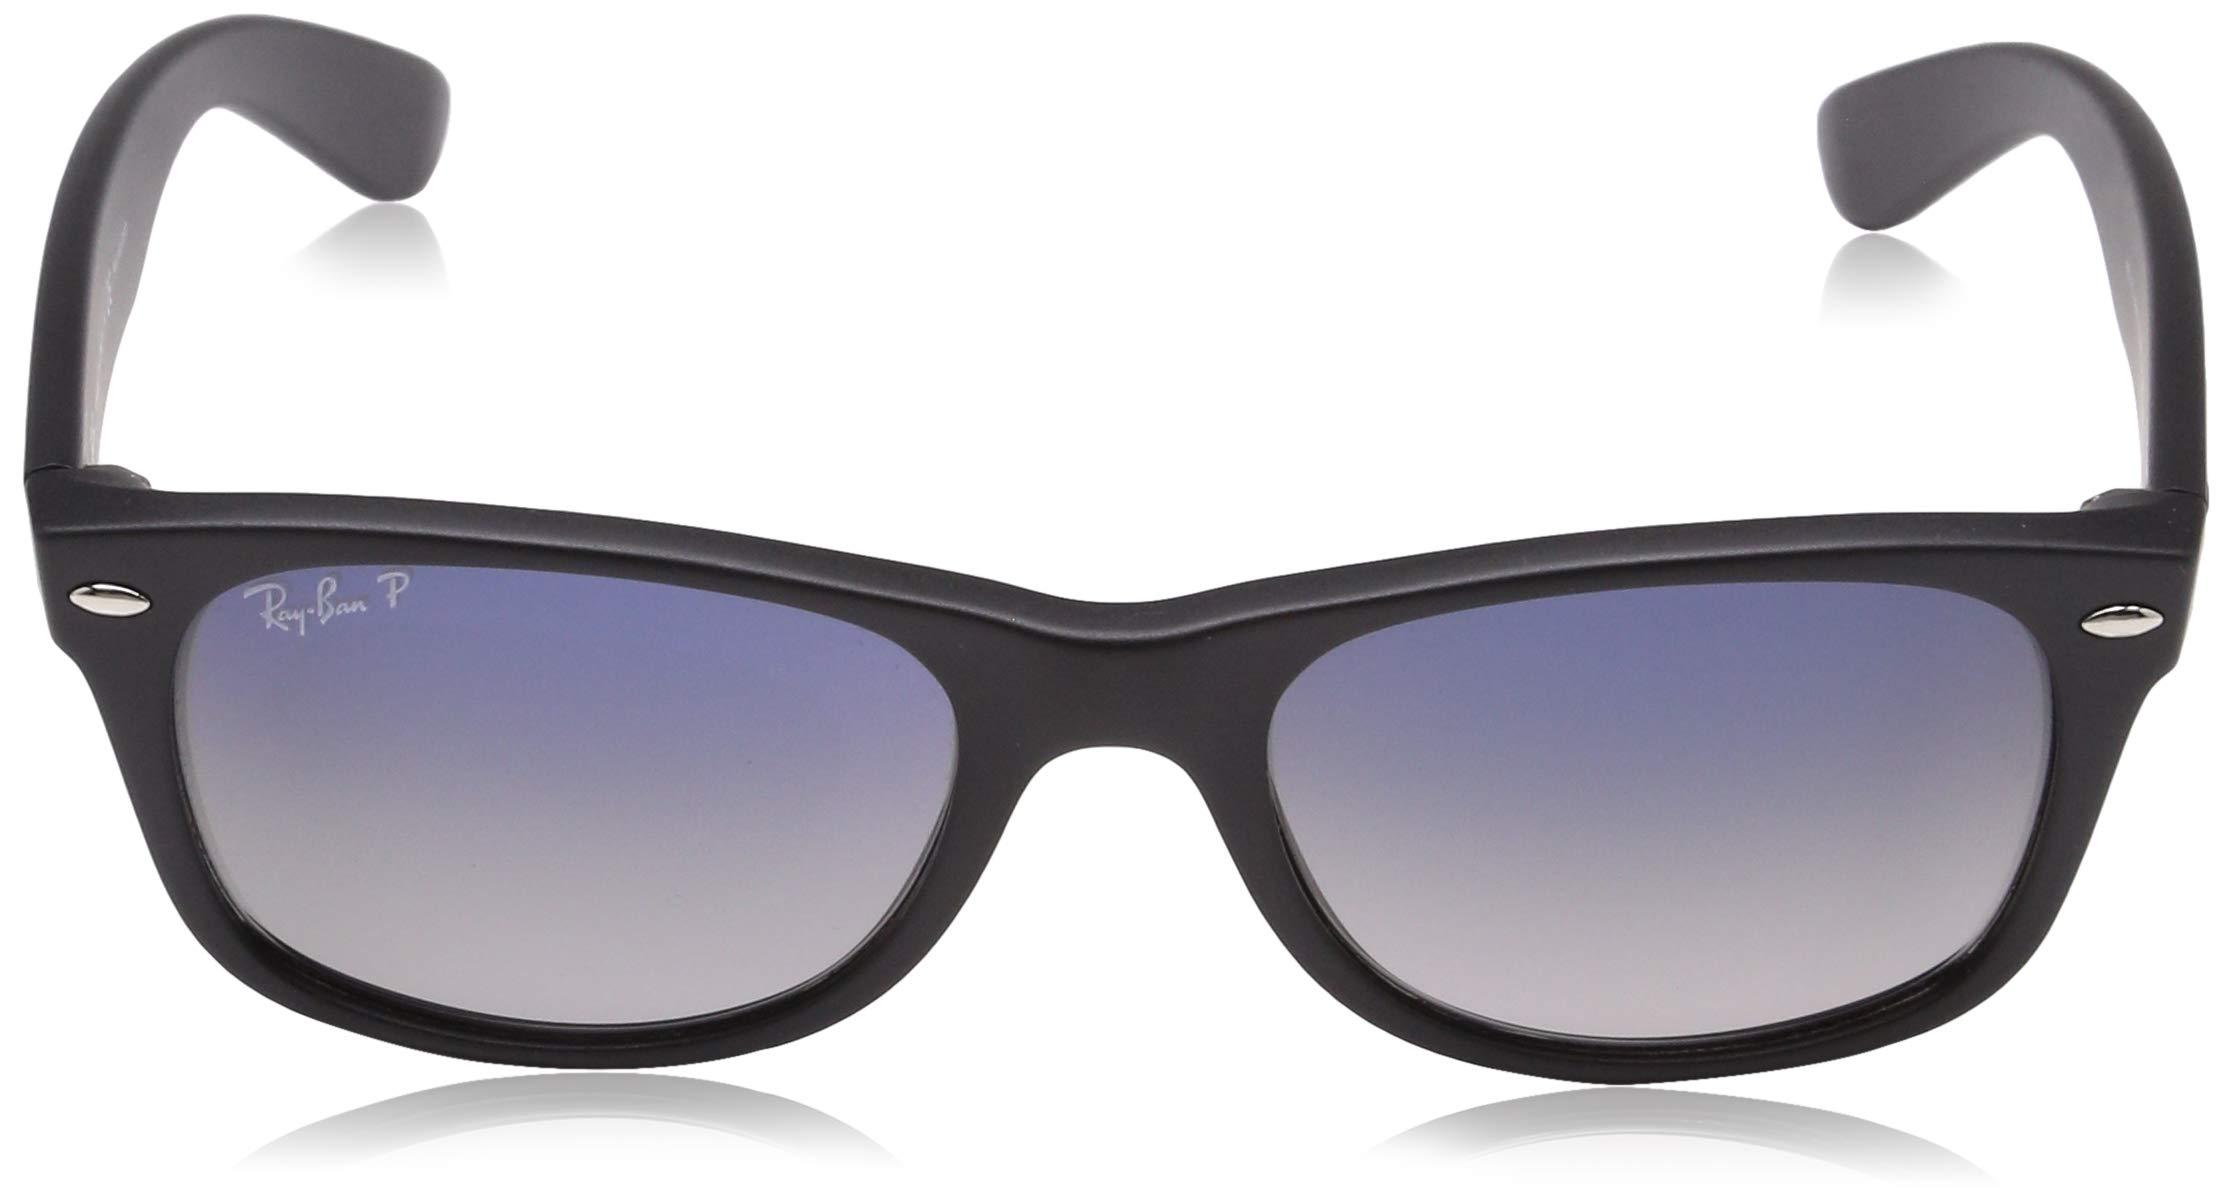 Ray-Ban Unisex New Wayfarer Polarized Sunglasses, Black/Polarized Blue/Grey Gradient, Blue Gradient Grey, 55mm by Ray-Ban (Image #2)